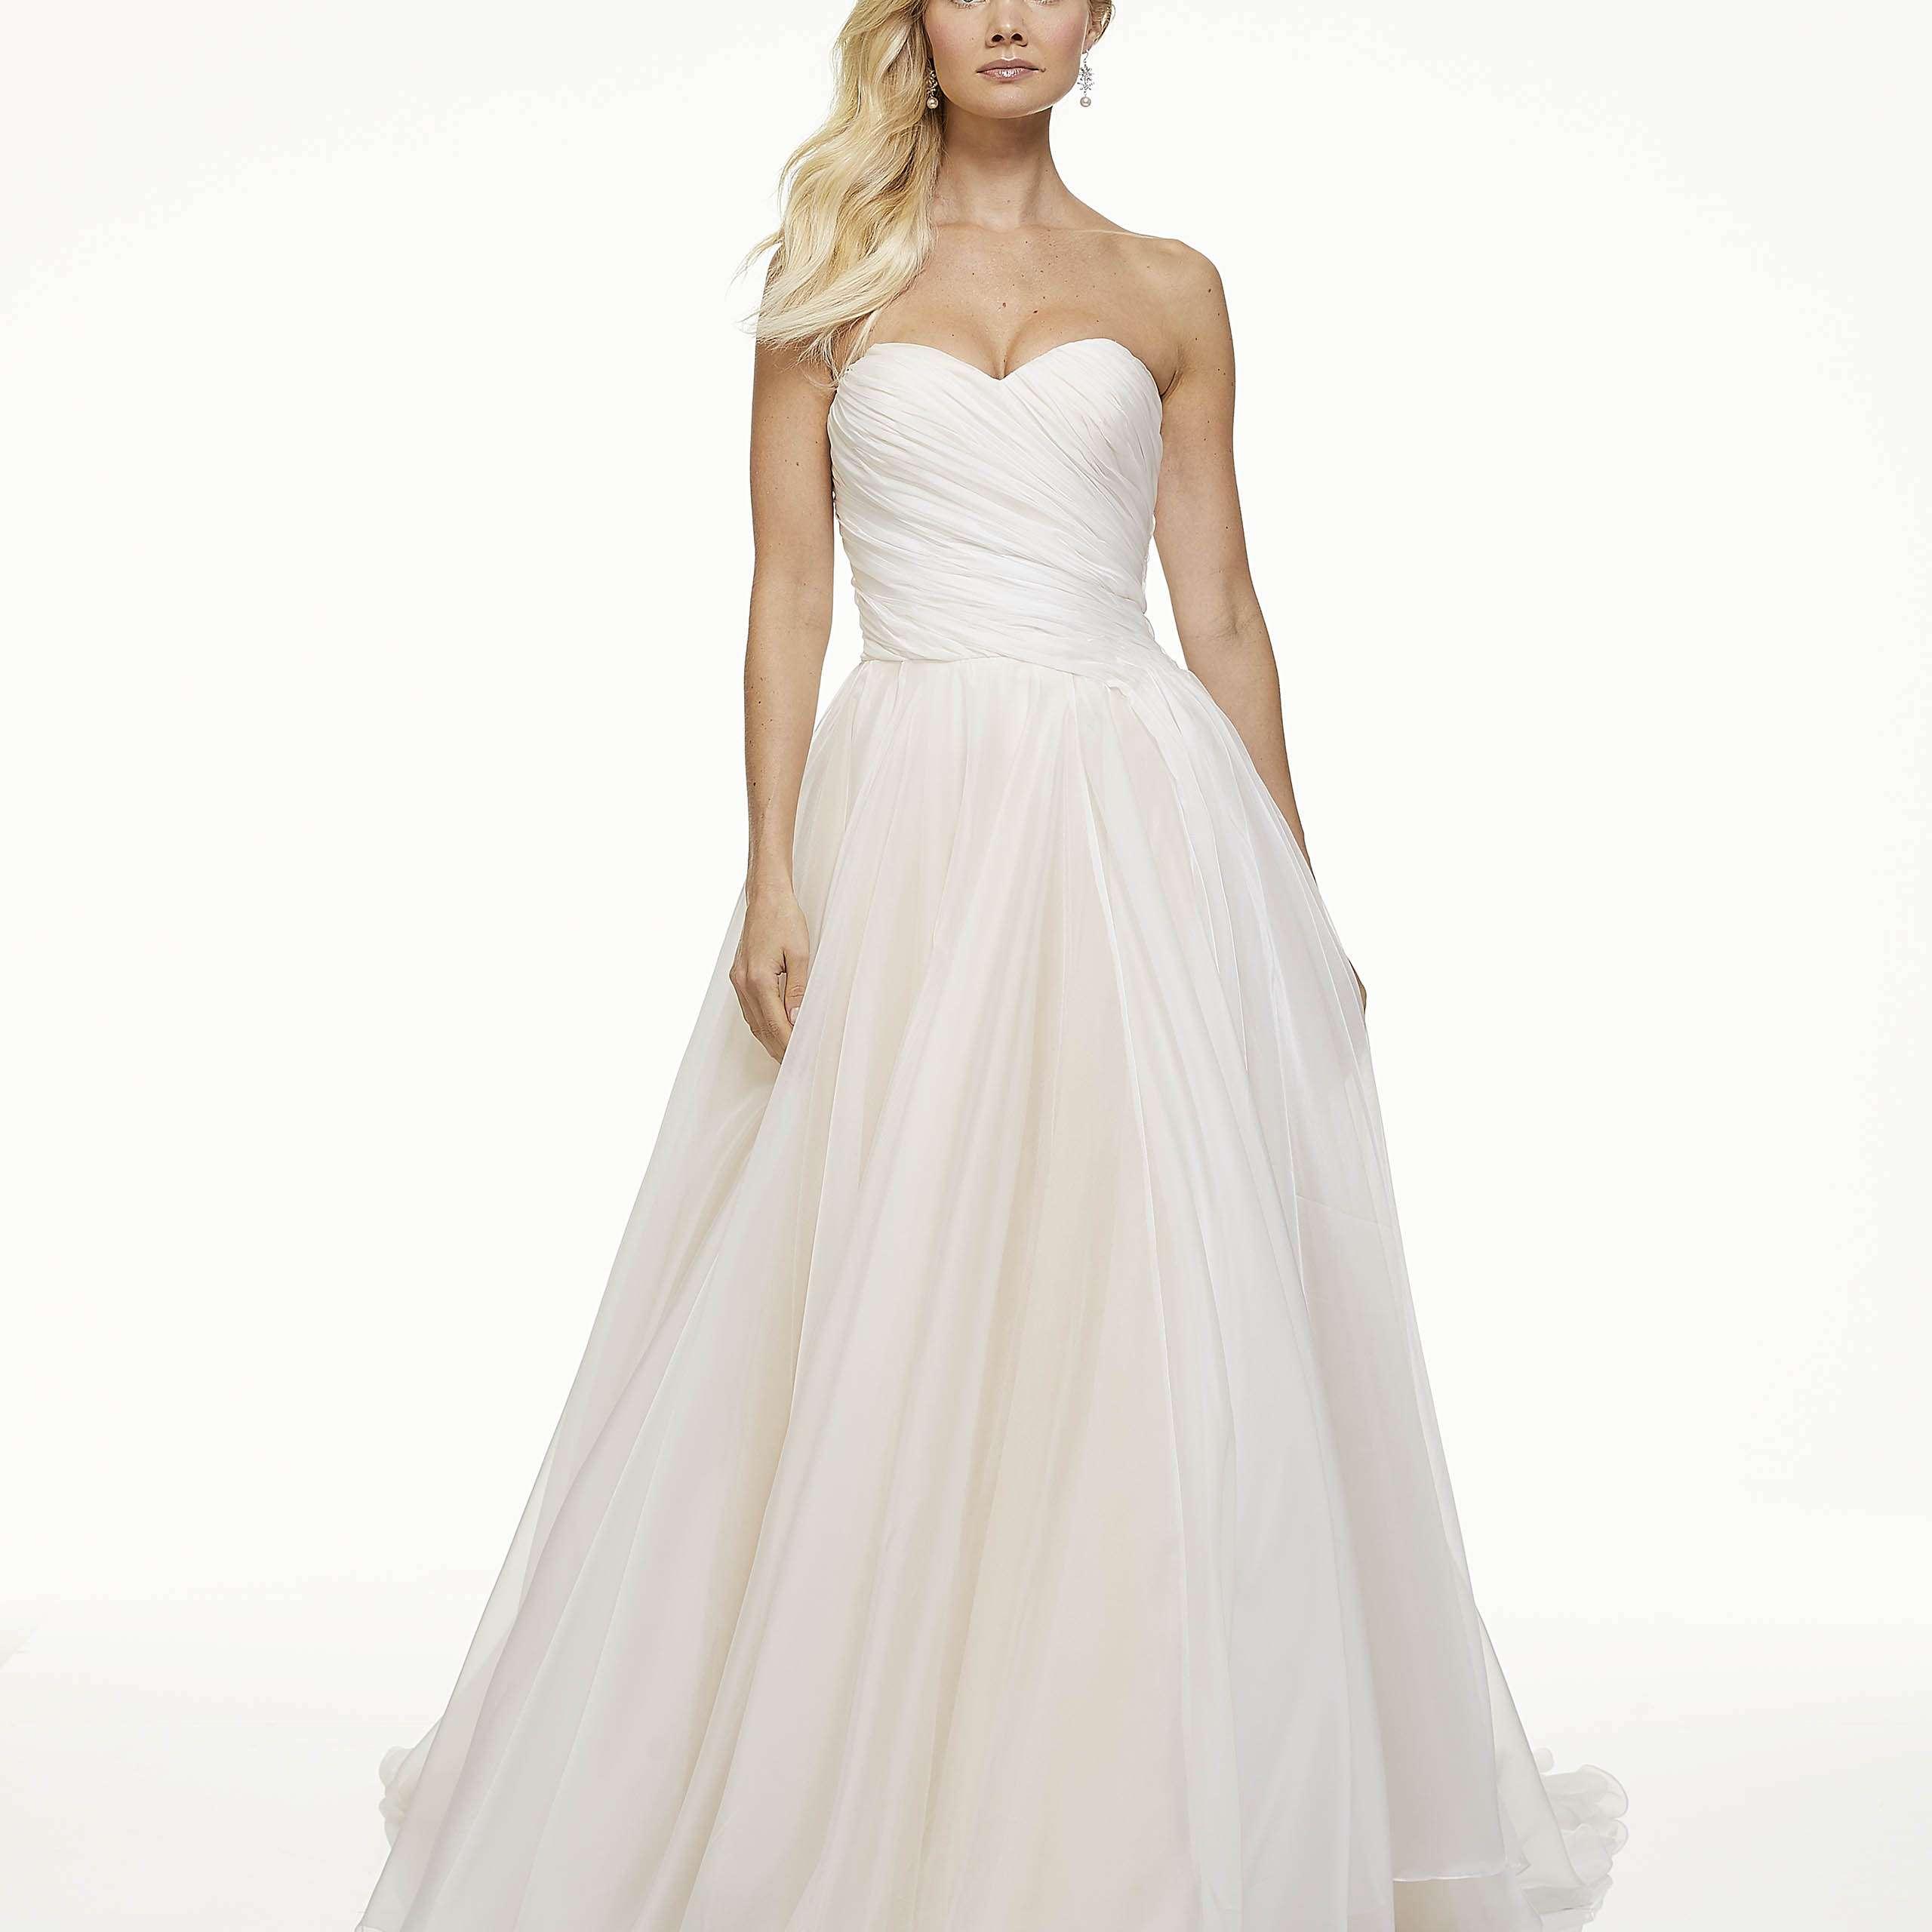 Model in strapless A-line wedding dress